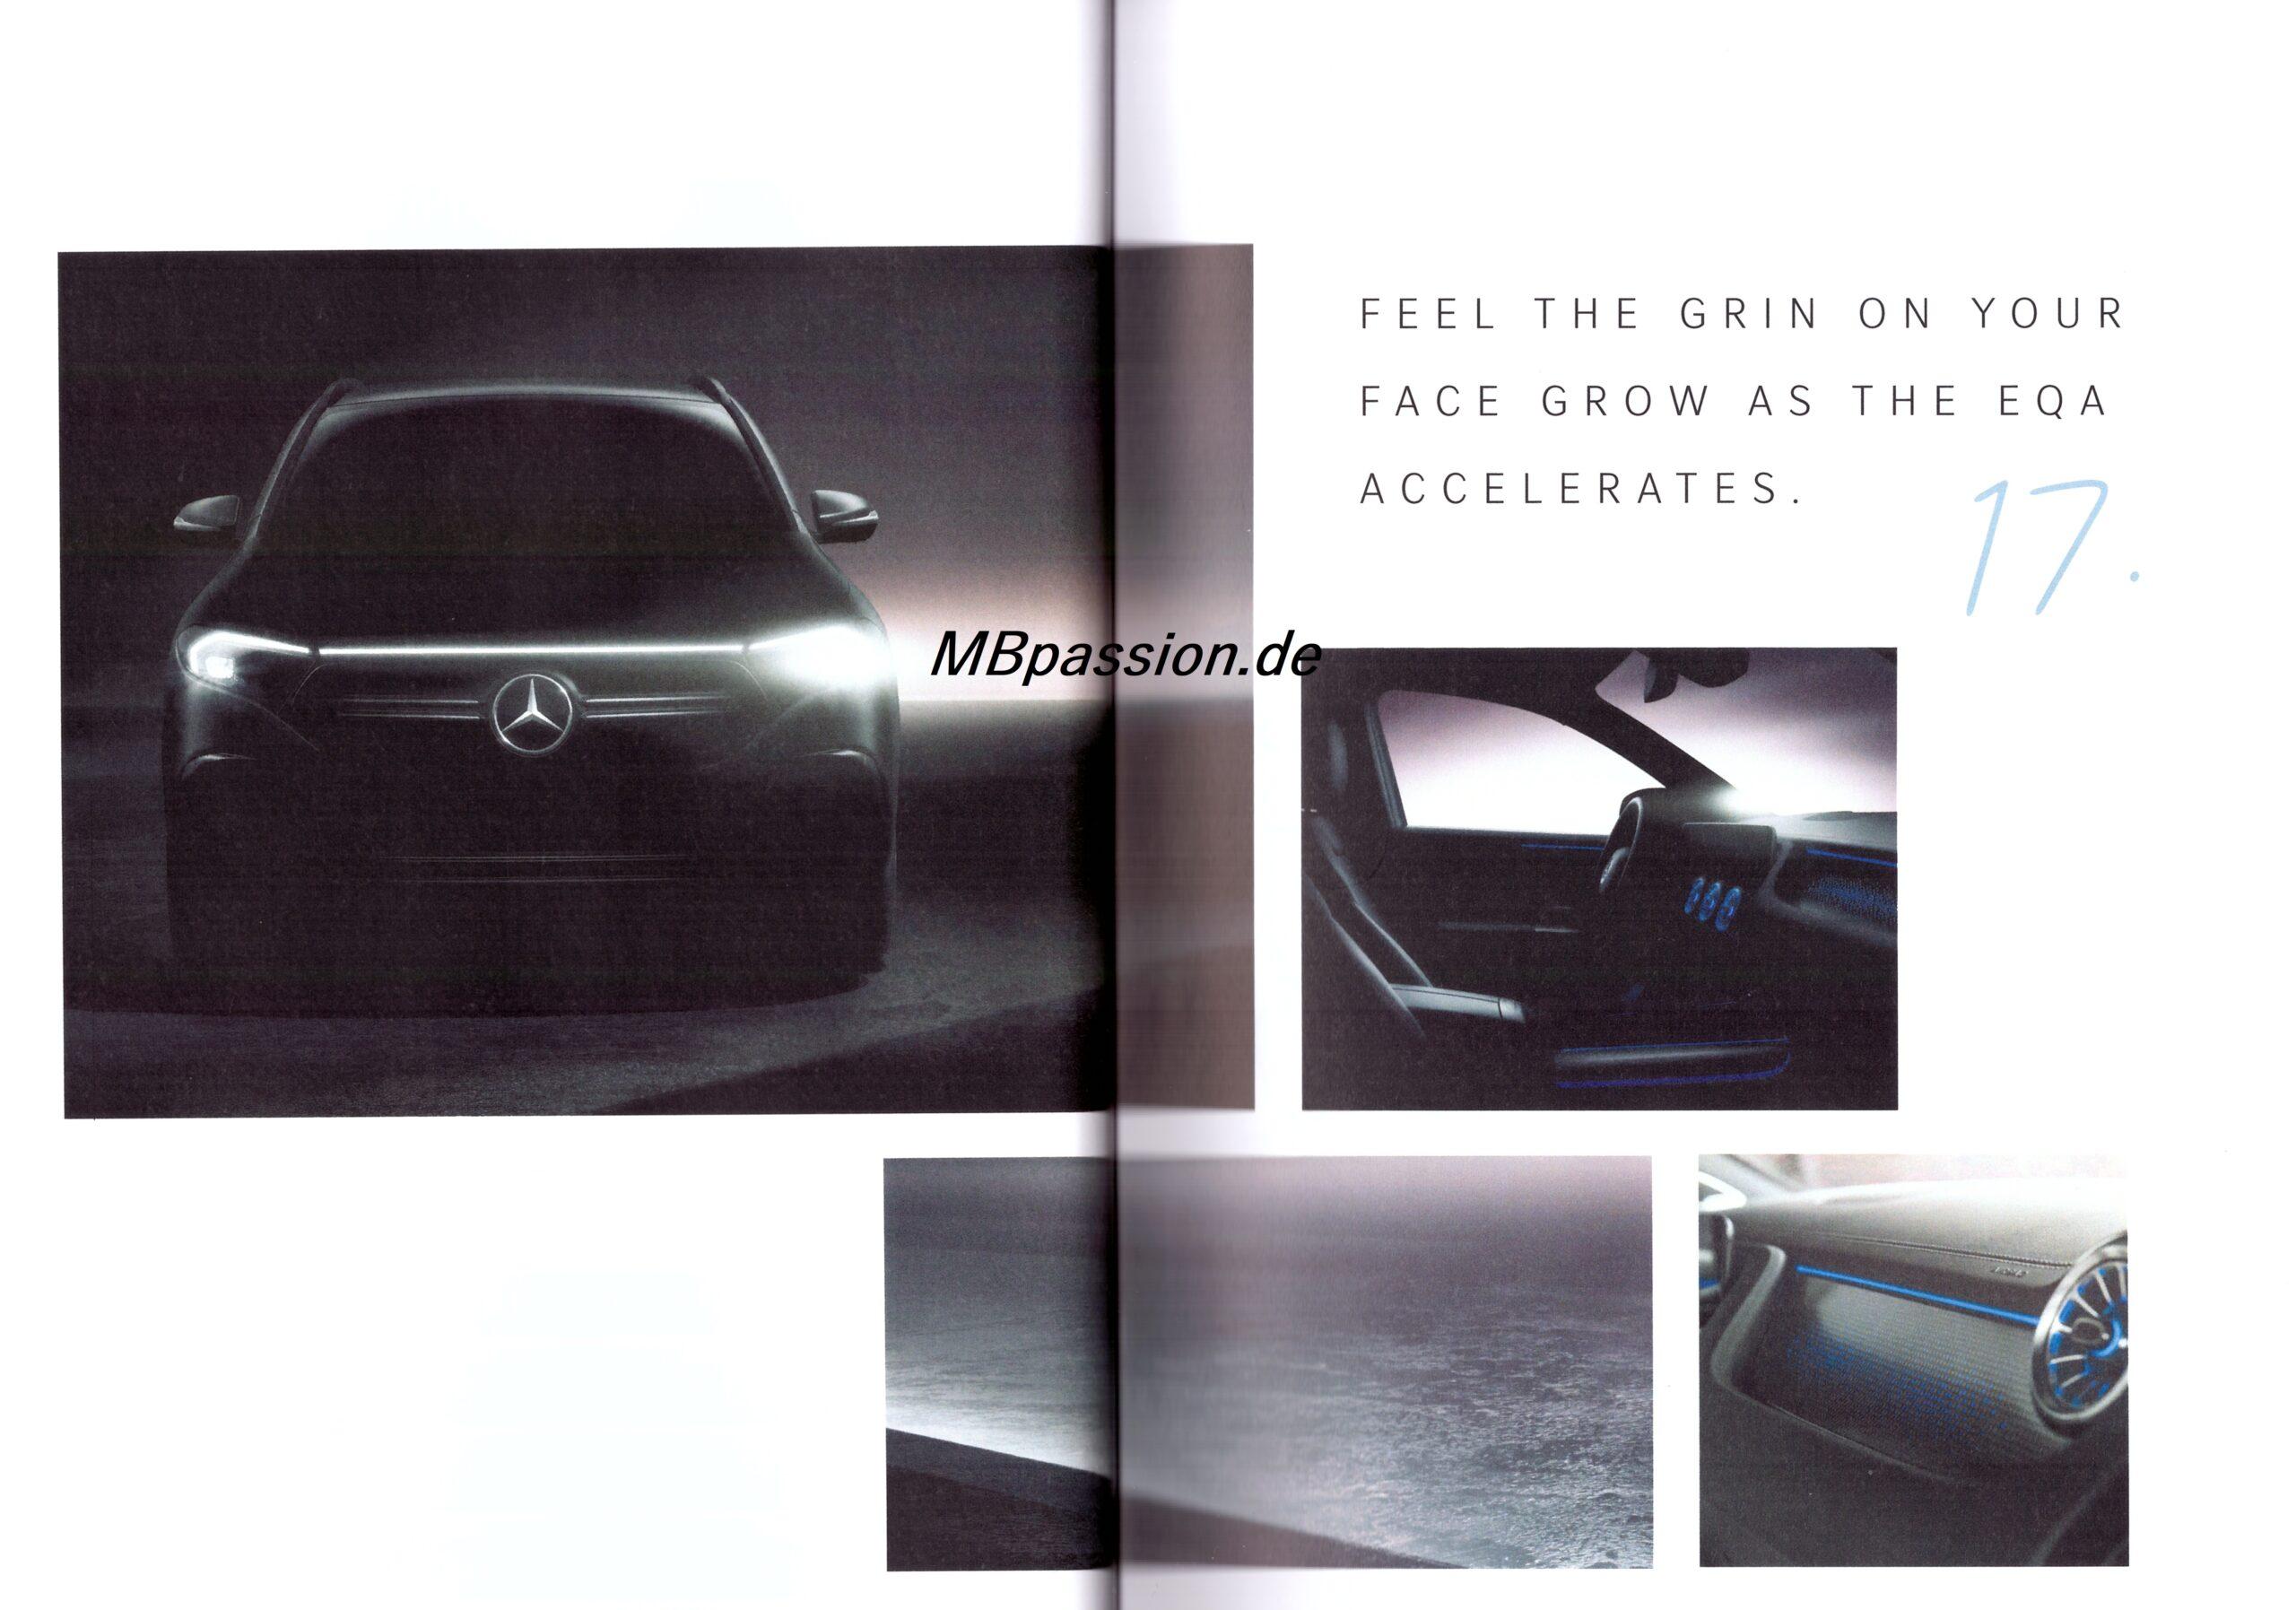 Mercedes-Benz teasert EQA vorab der Weltpremiere am 20. Januar erneut an